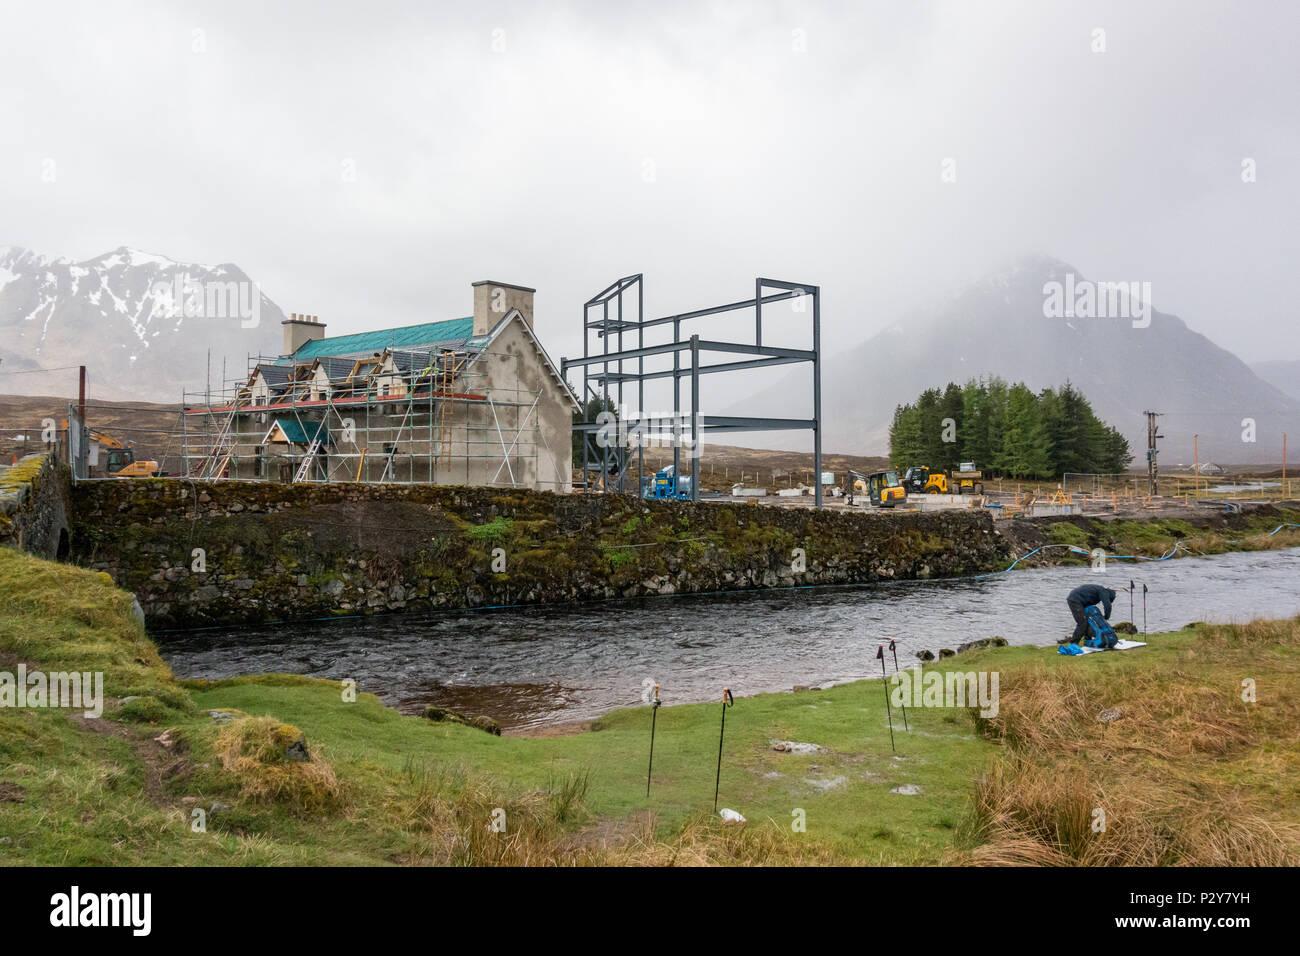 Kings House Hotel, Glencoe, Scotland, UK during redevelopment works in 2018 - Stock Image